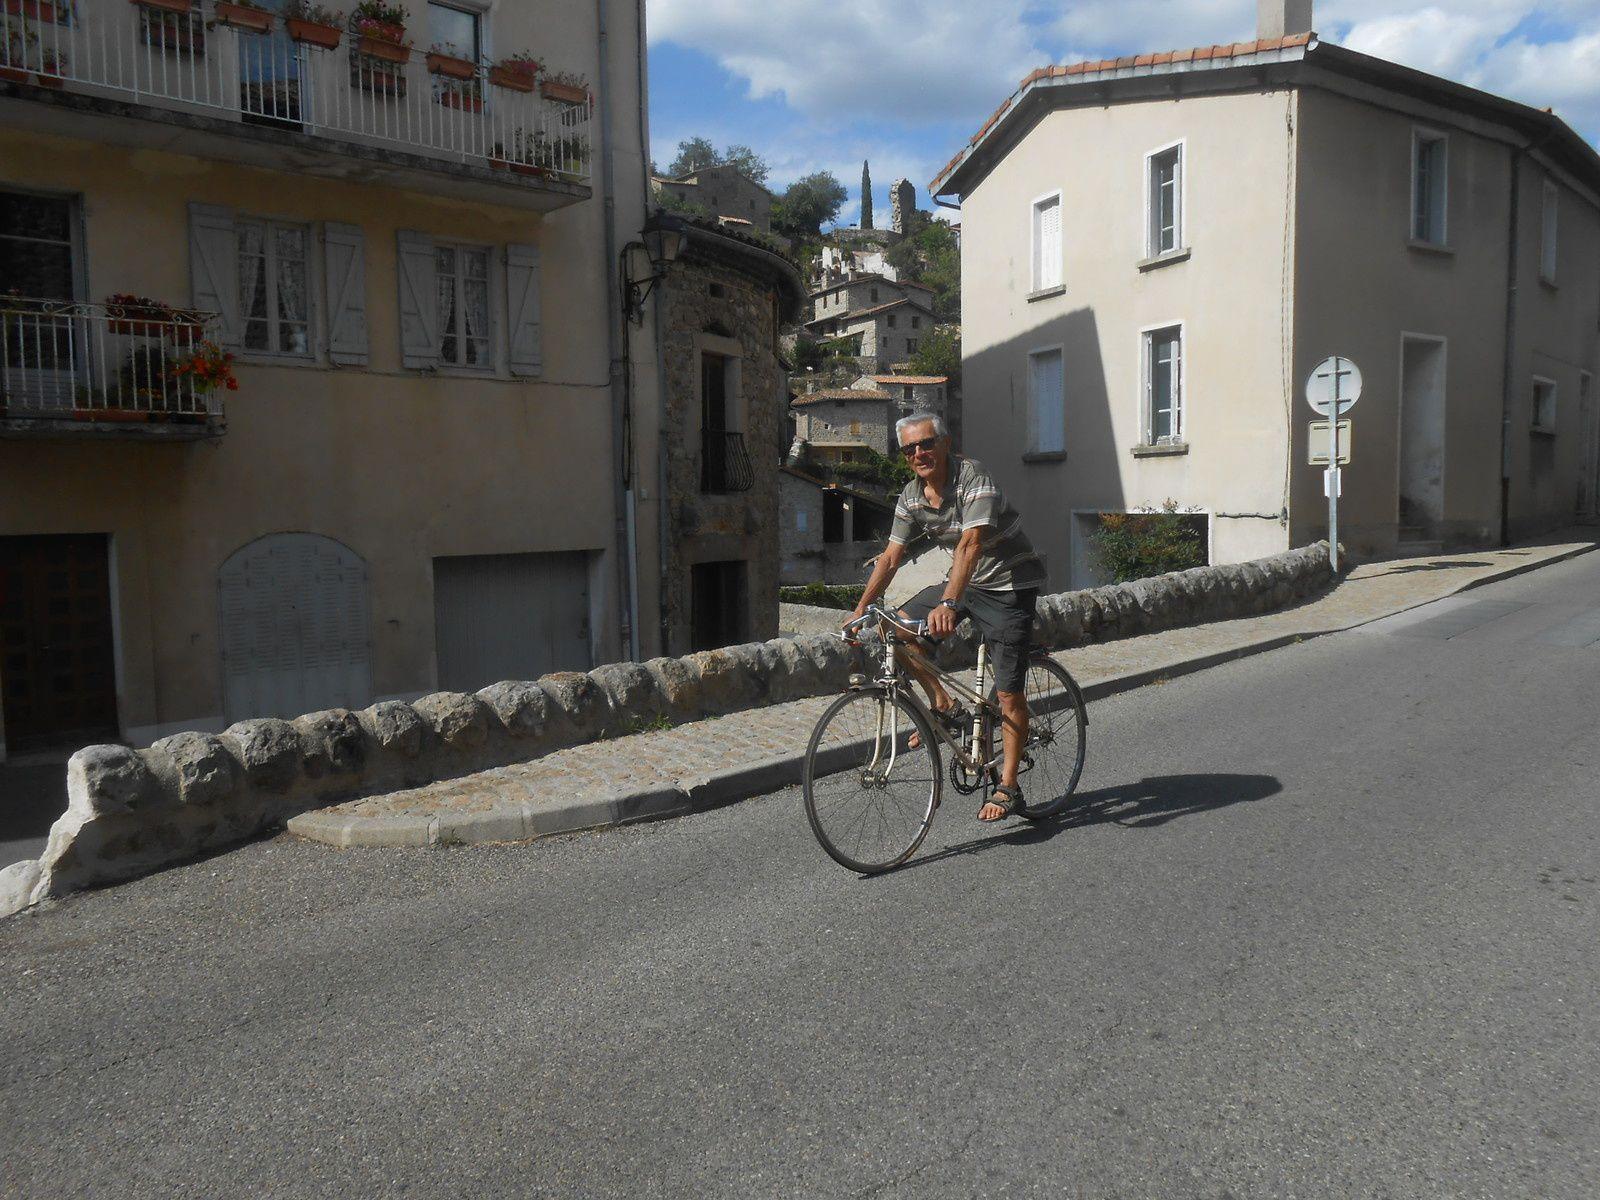 Jo Pinède, cycliste averti, annonce la fin de course